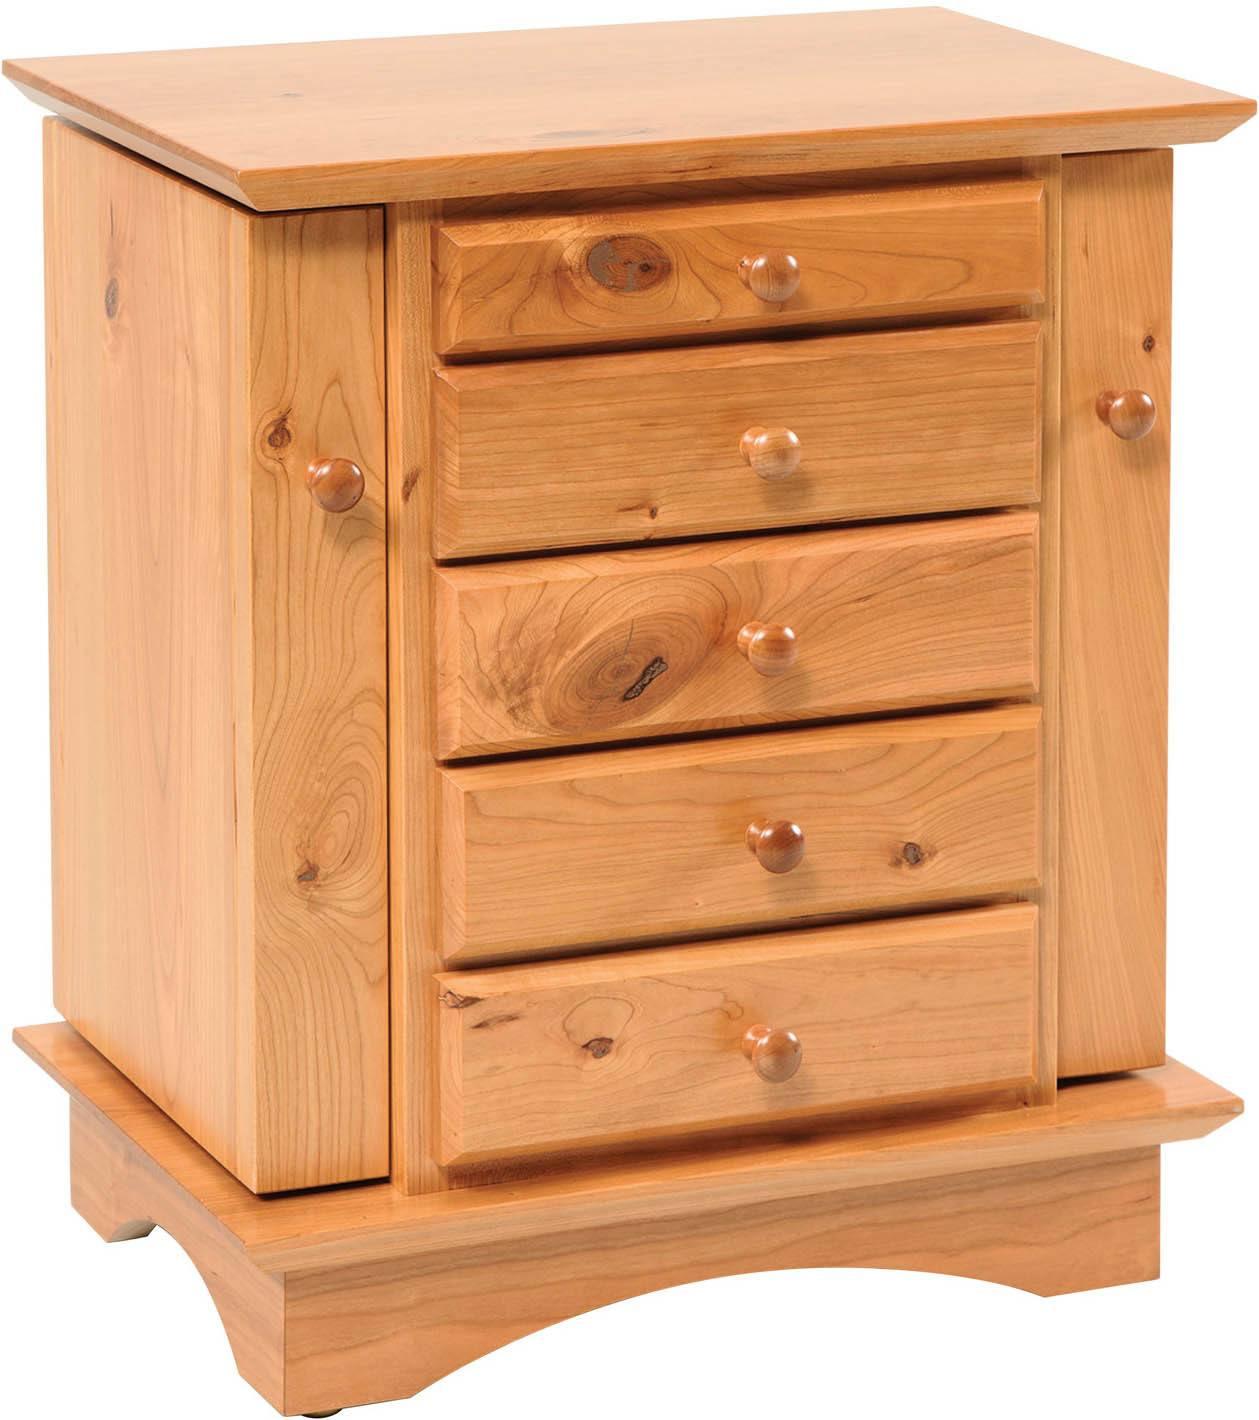 20 inch Shaker Dresser Top Jewelry Cabinet